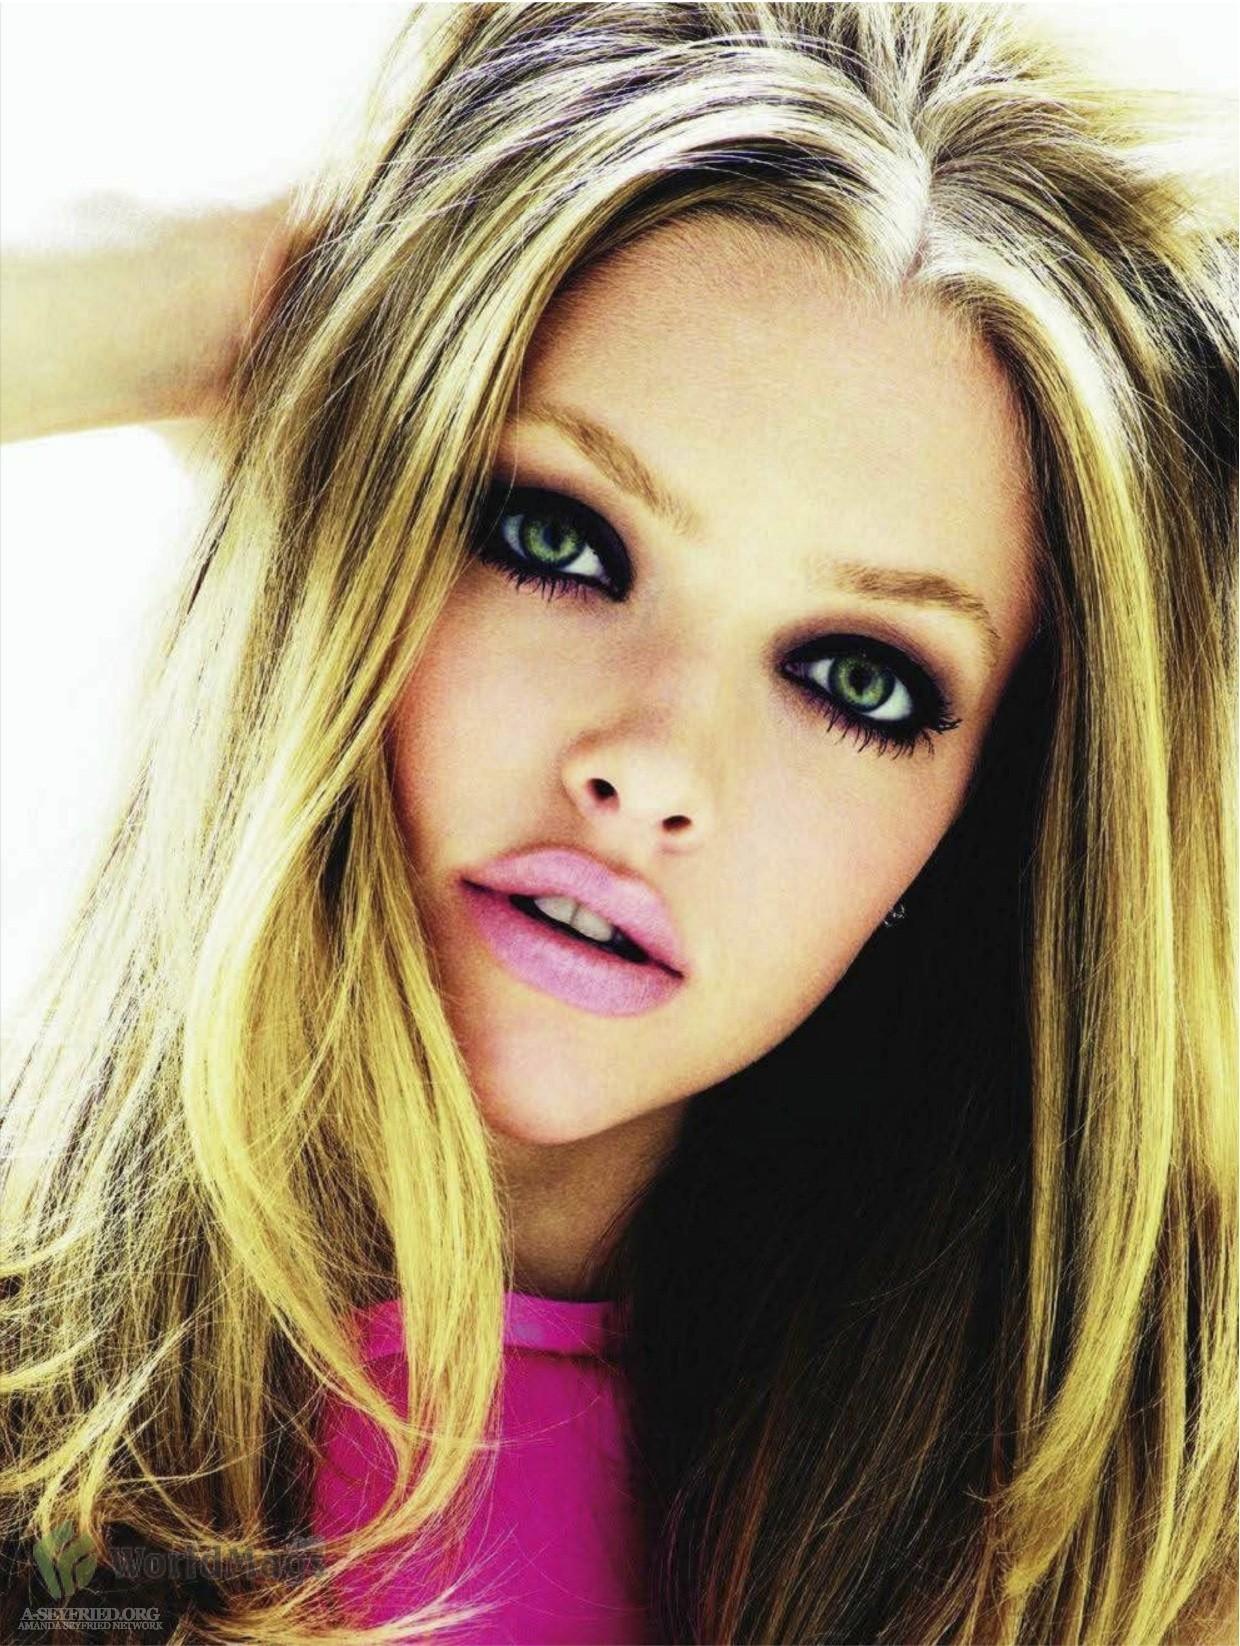 Scans-of-Amanda-in-Glamour-UK-magazine-Including-new-pics-interview-amanda-seyfried-25870712-1240-1646